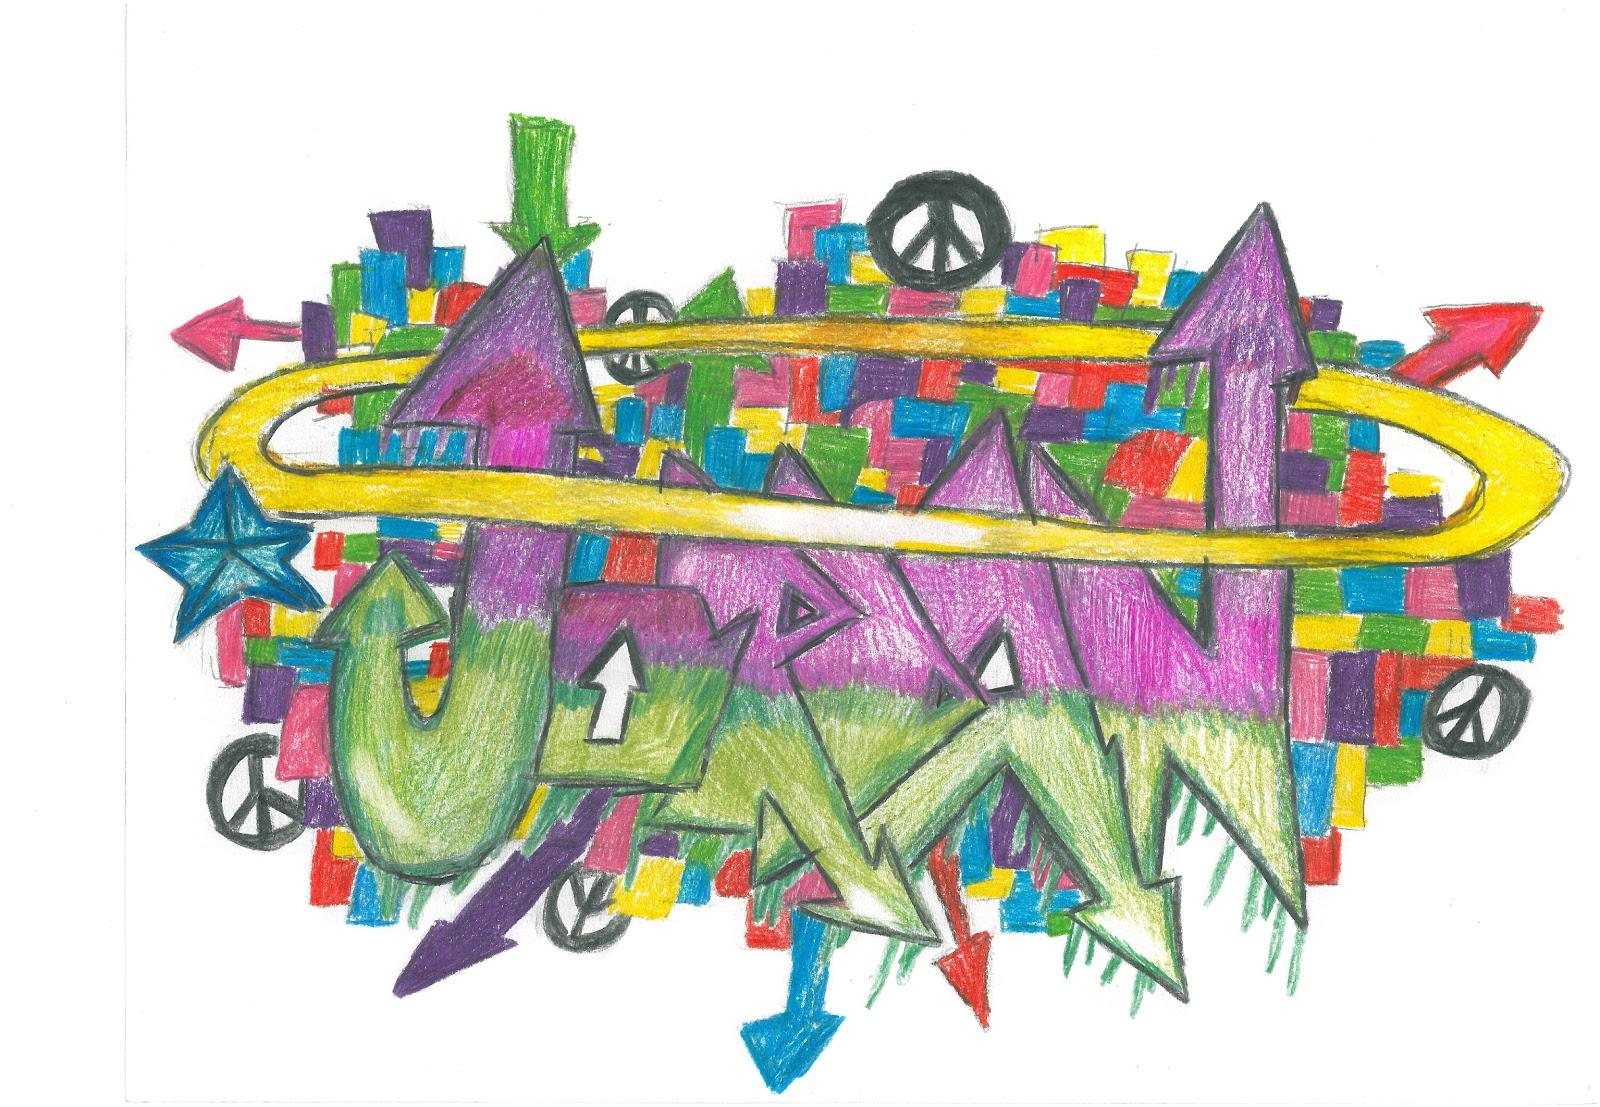 vandalisme essay